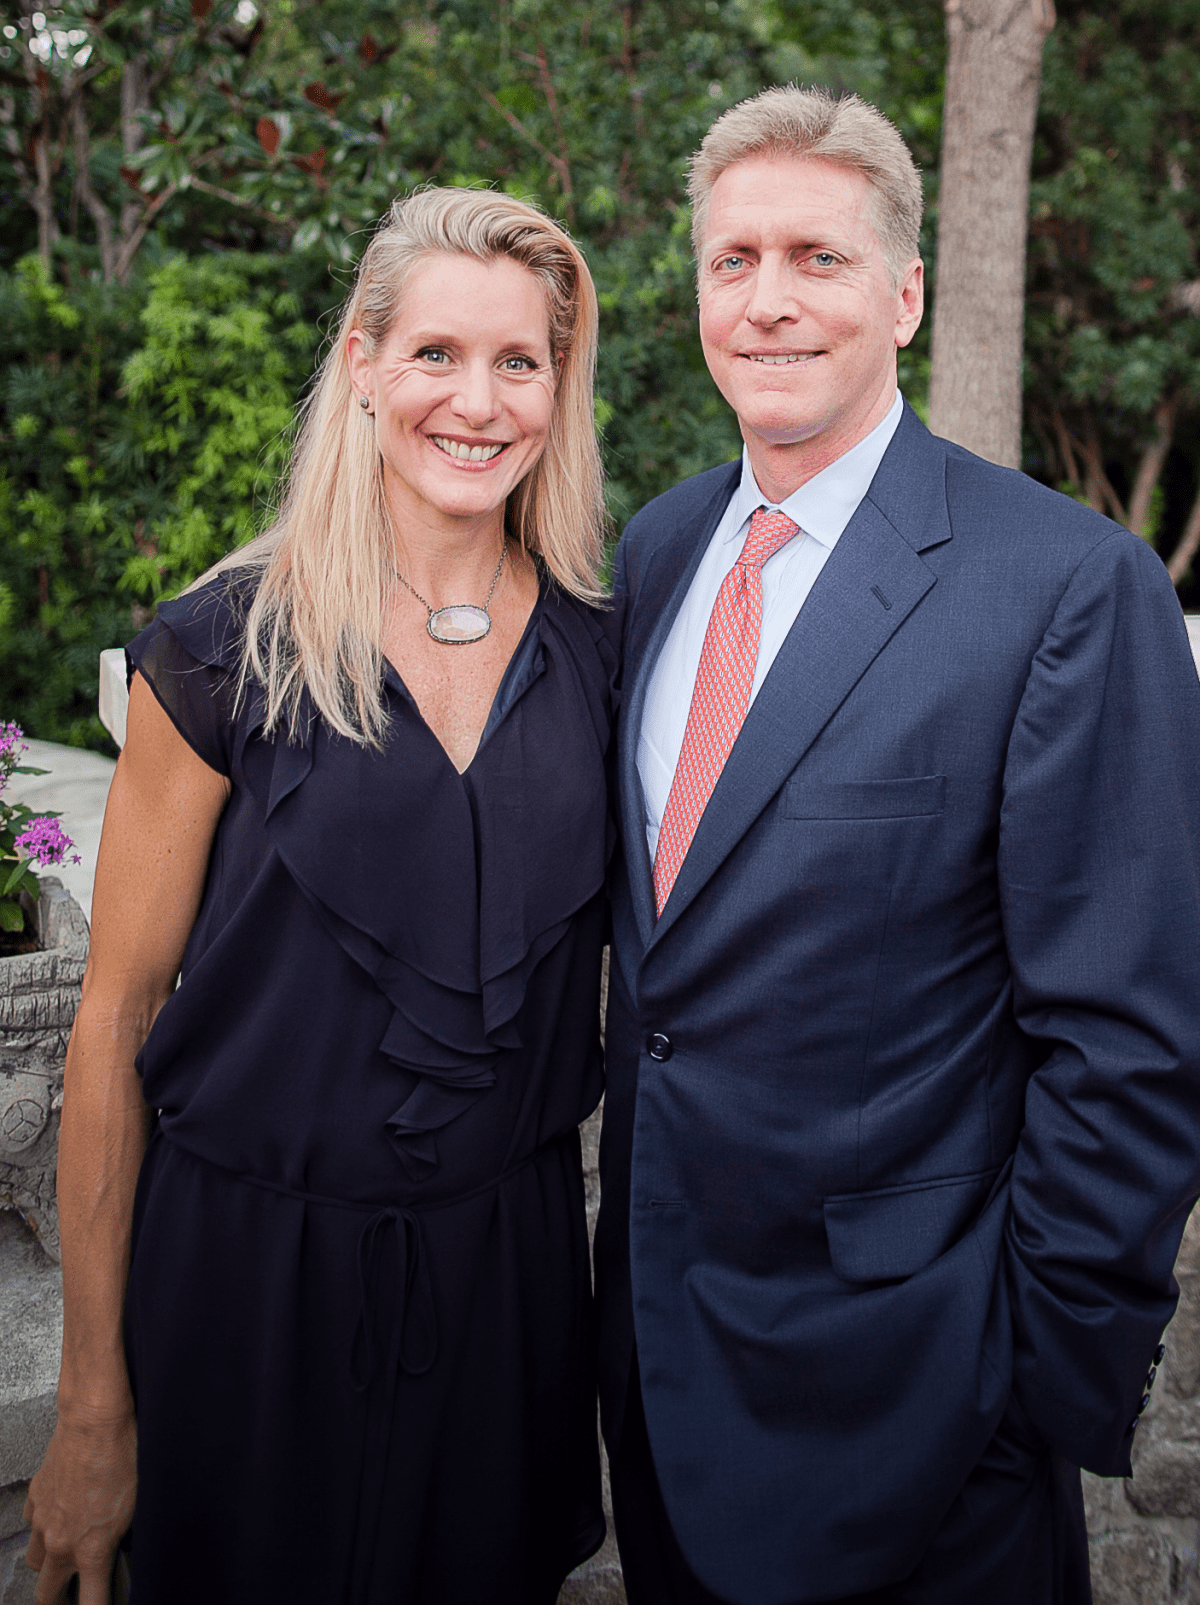 Houston, Robert Draper book signing, September 2015, Paula and Jeff Paine